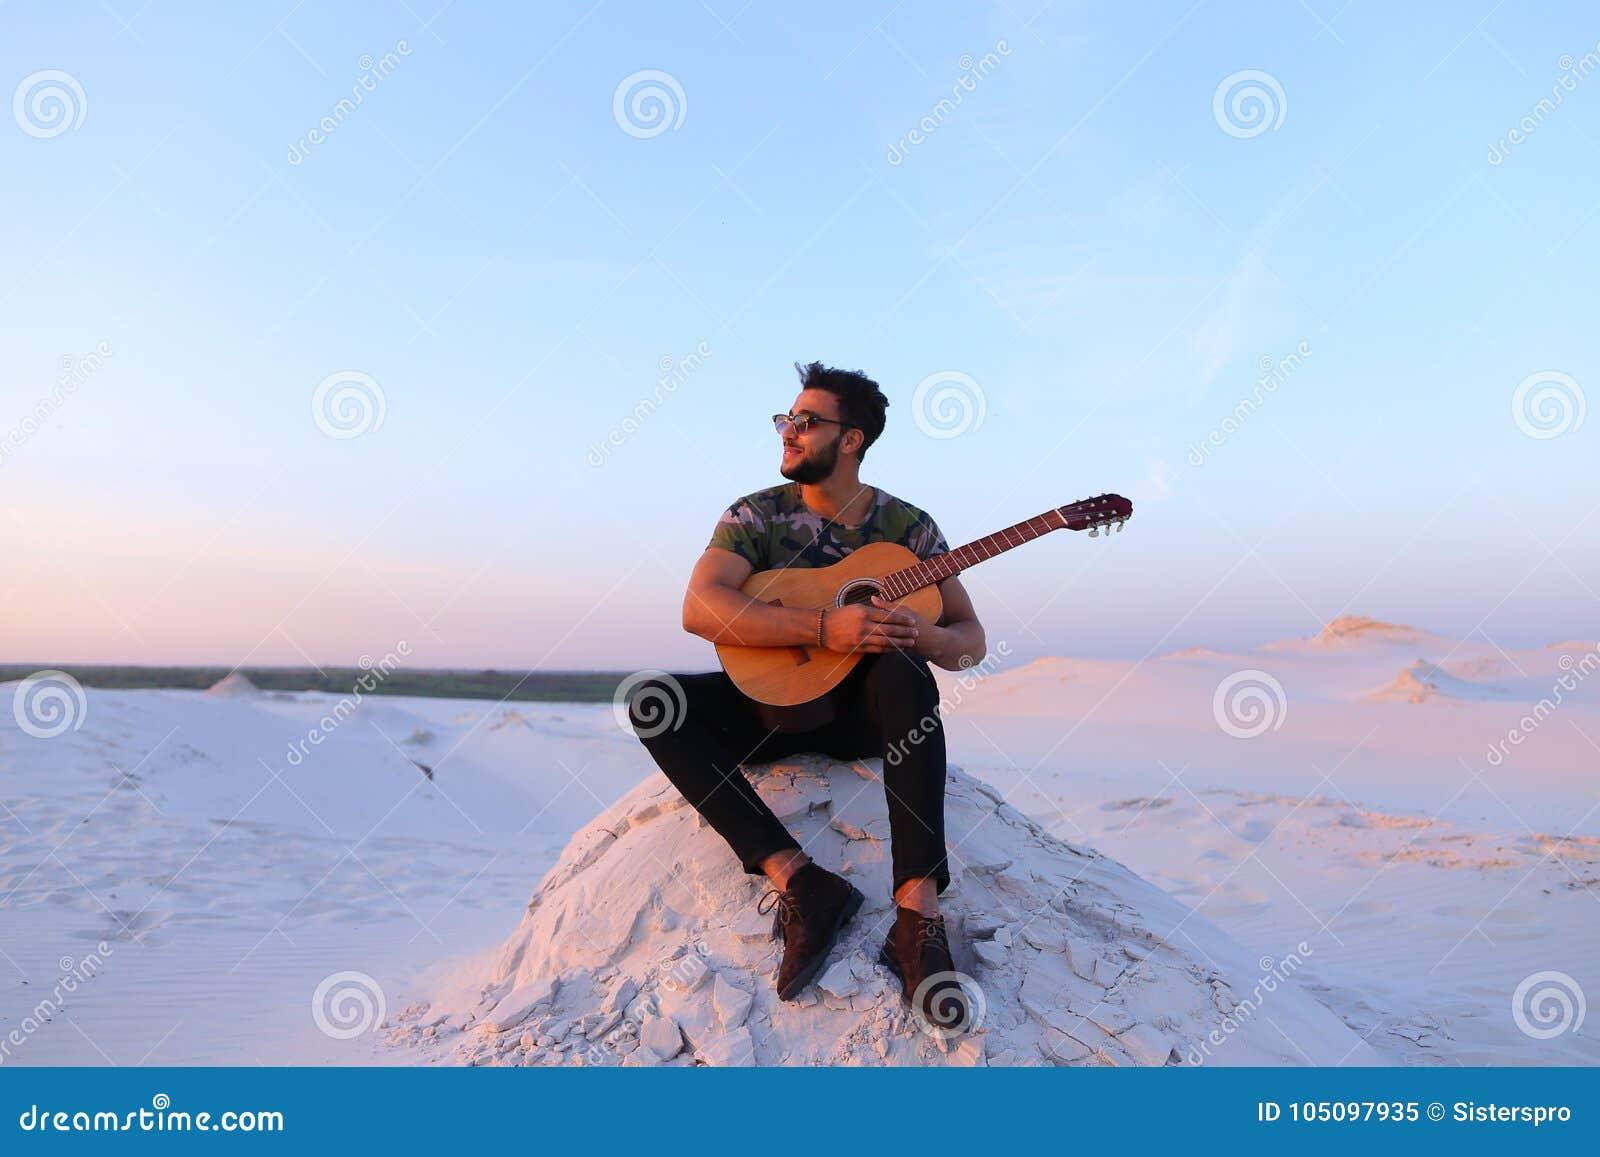 Attractive Arabian Guy Sings Songs On Guitar Sitting On Hill In